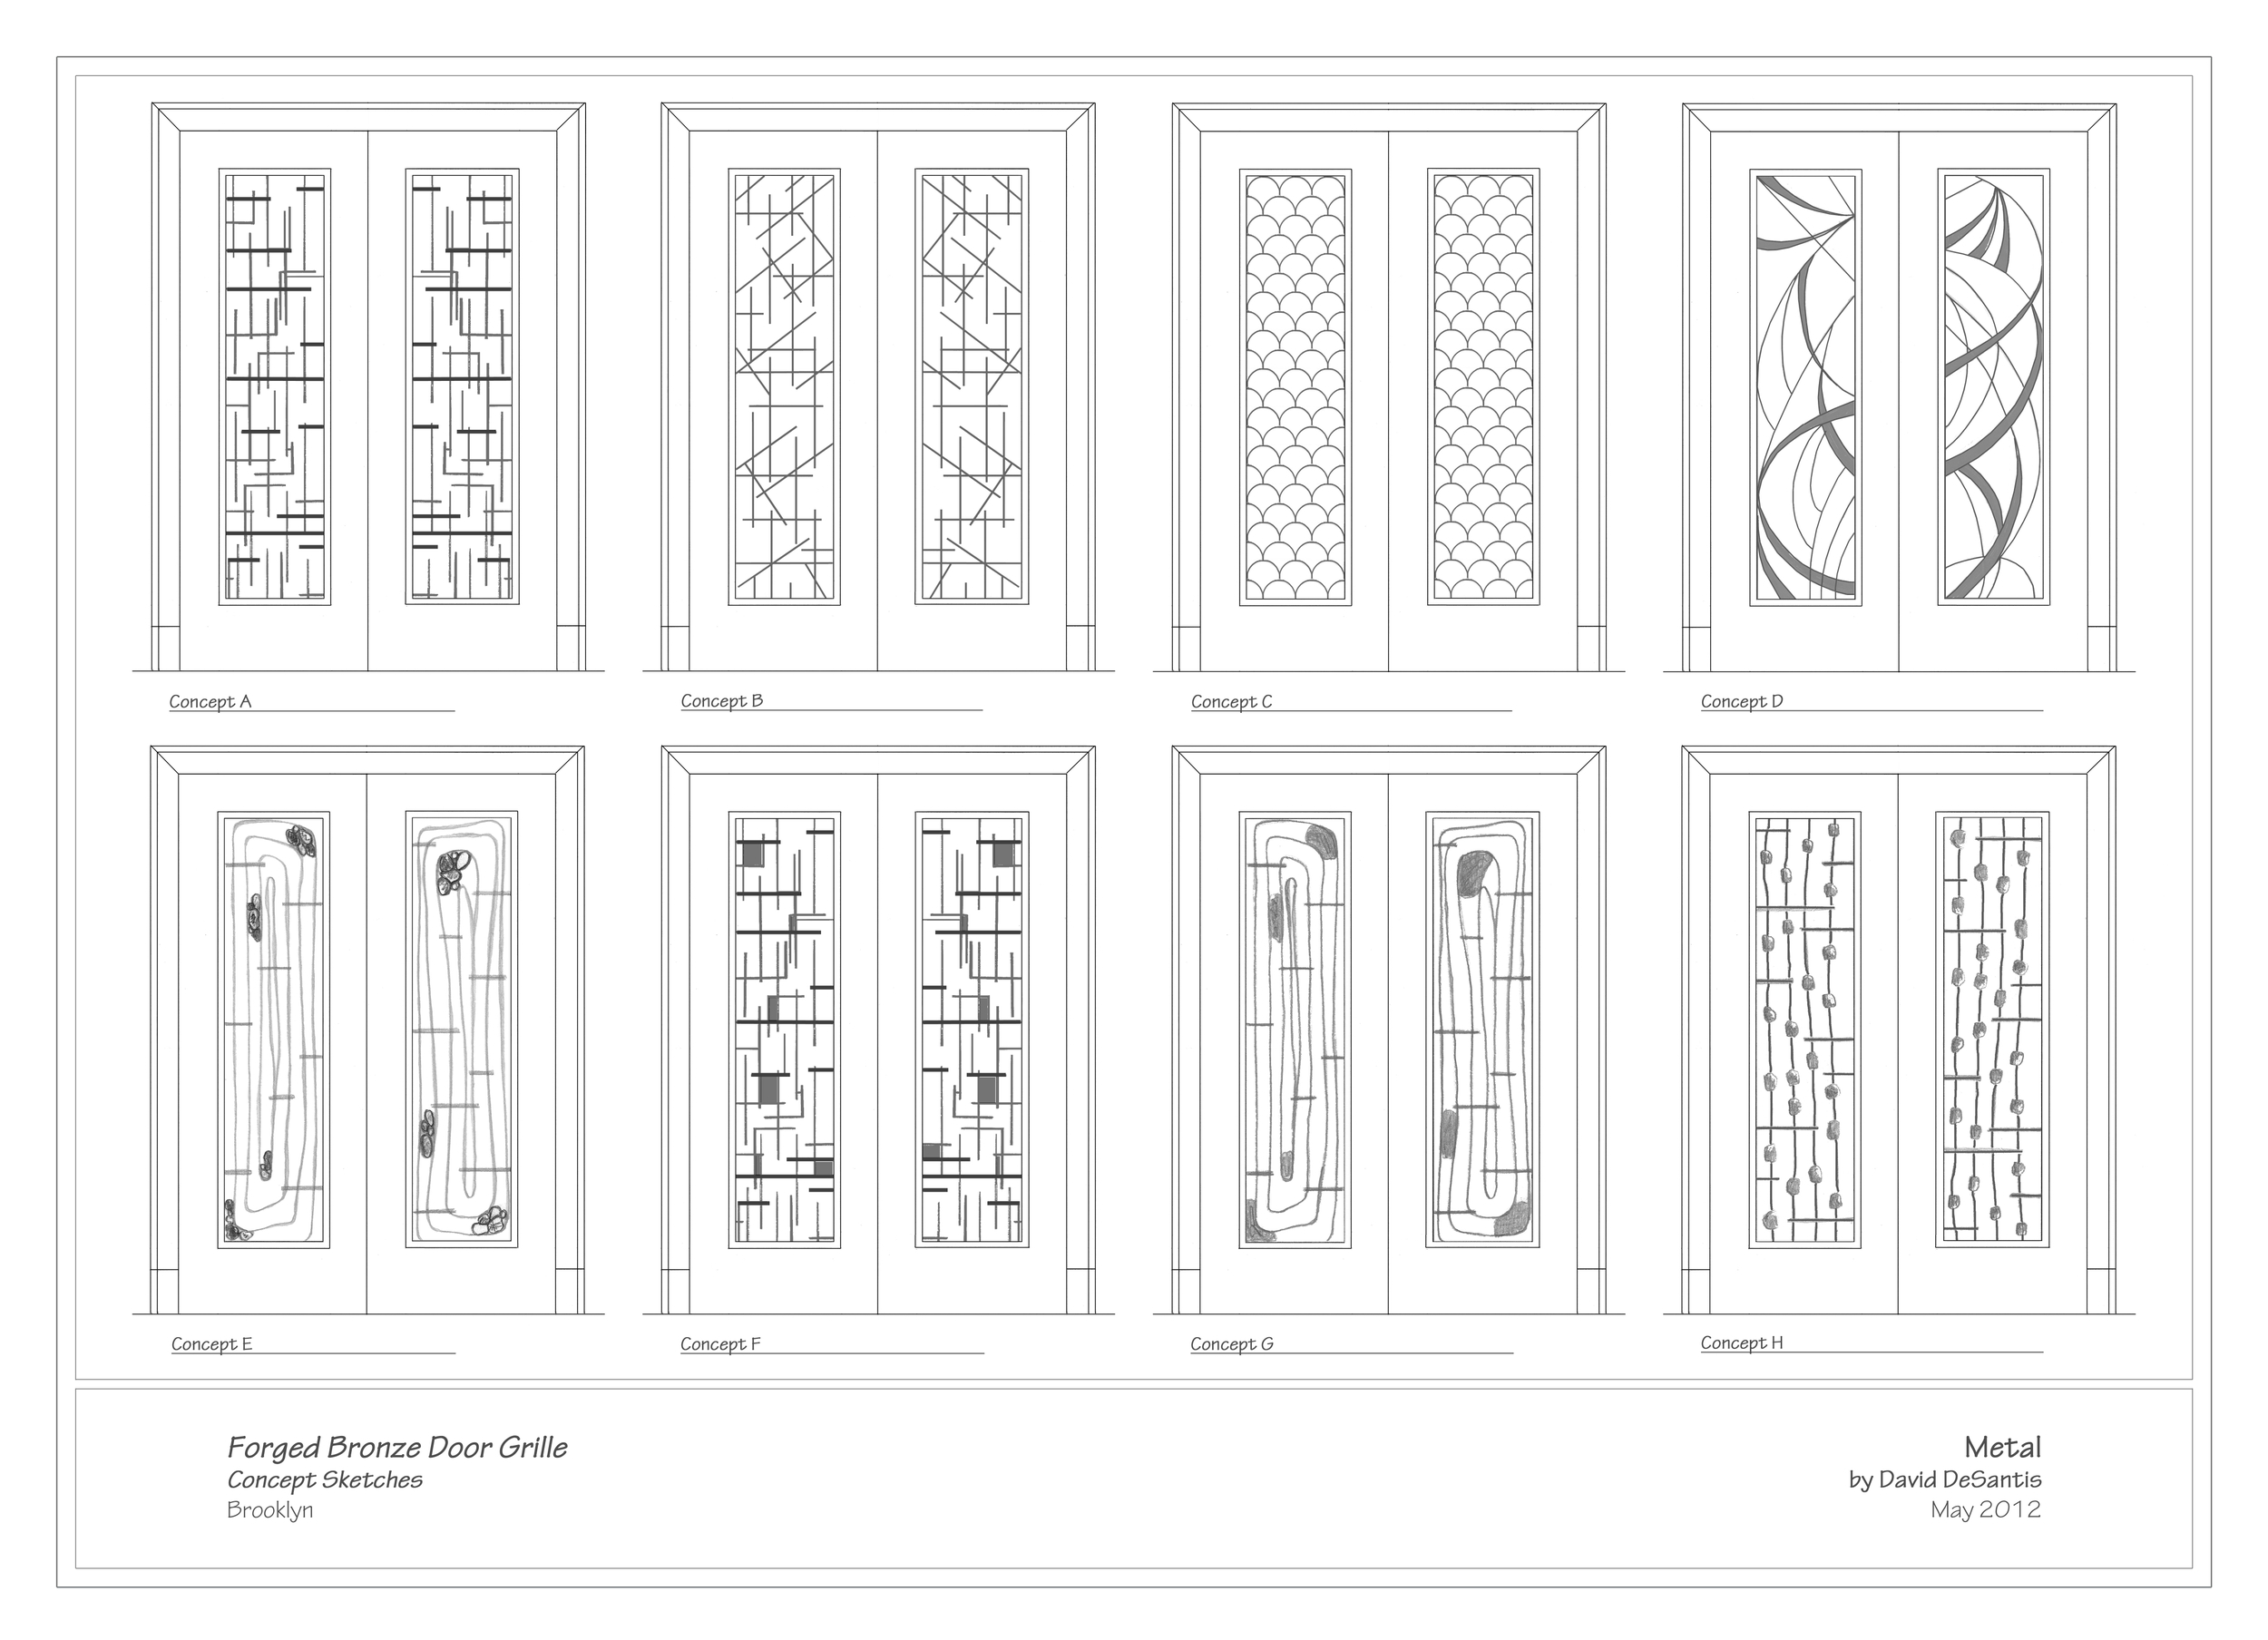 Bronze Dorr Grille Concepts.jpg